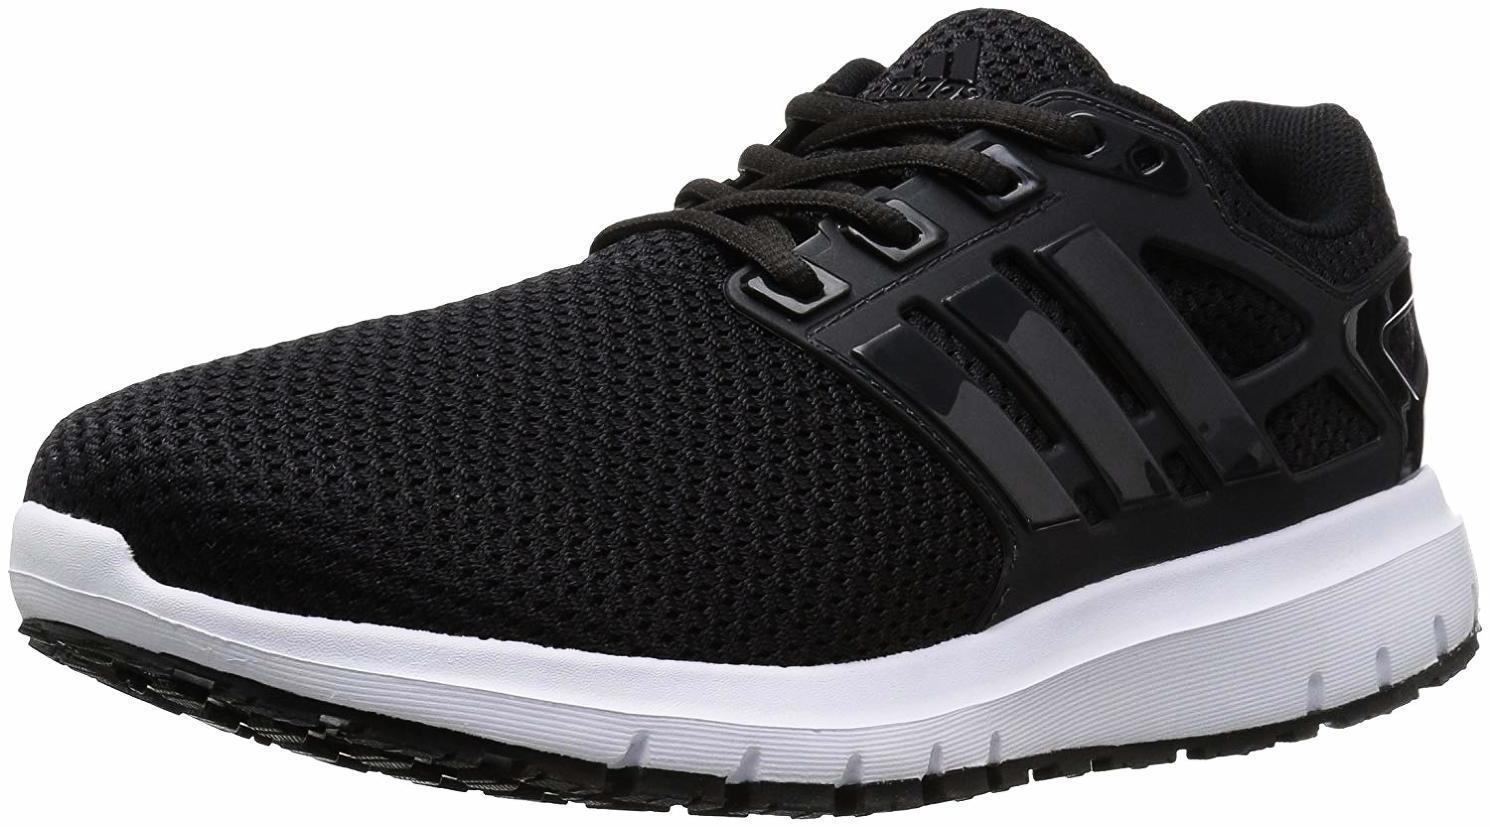 adidas hommes galaxie m piste runner homme - choisir sz couleur: homme runner femme: valeur bf3e17